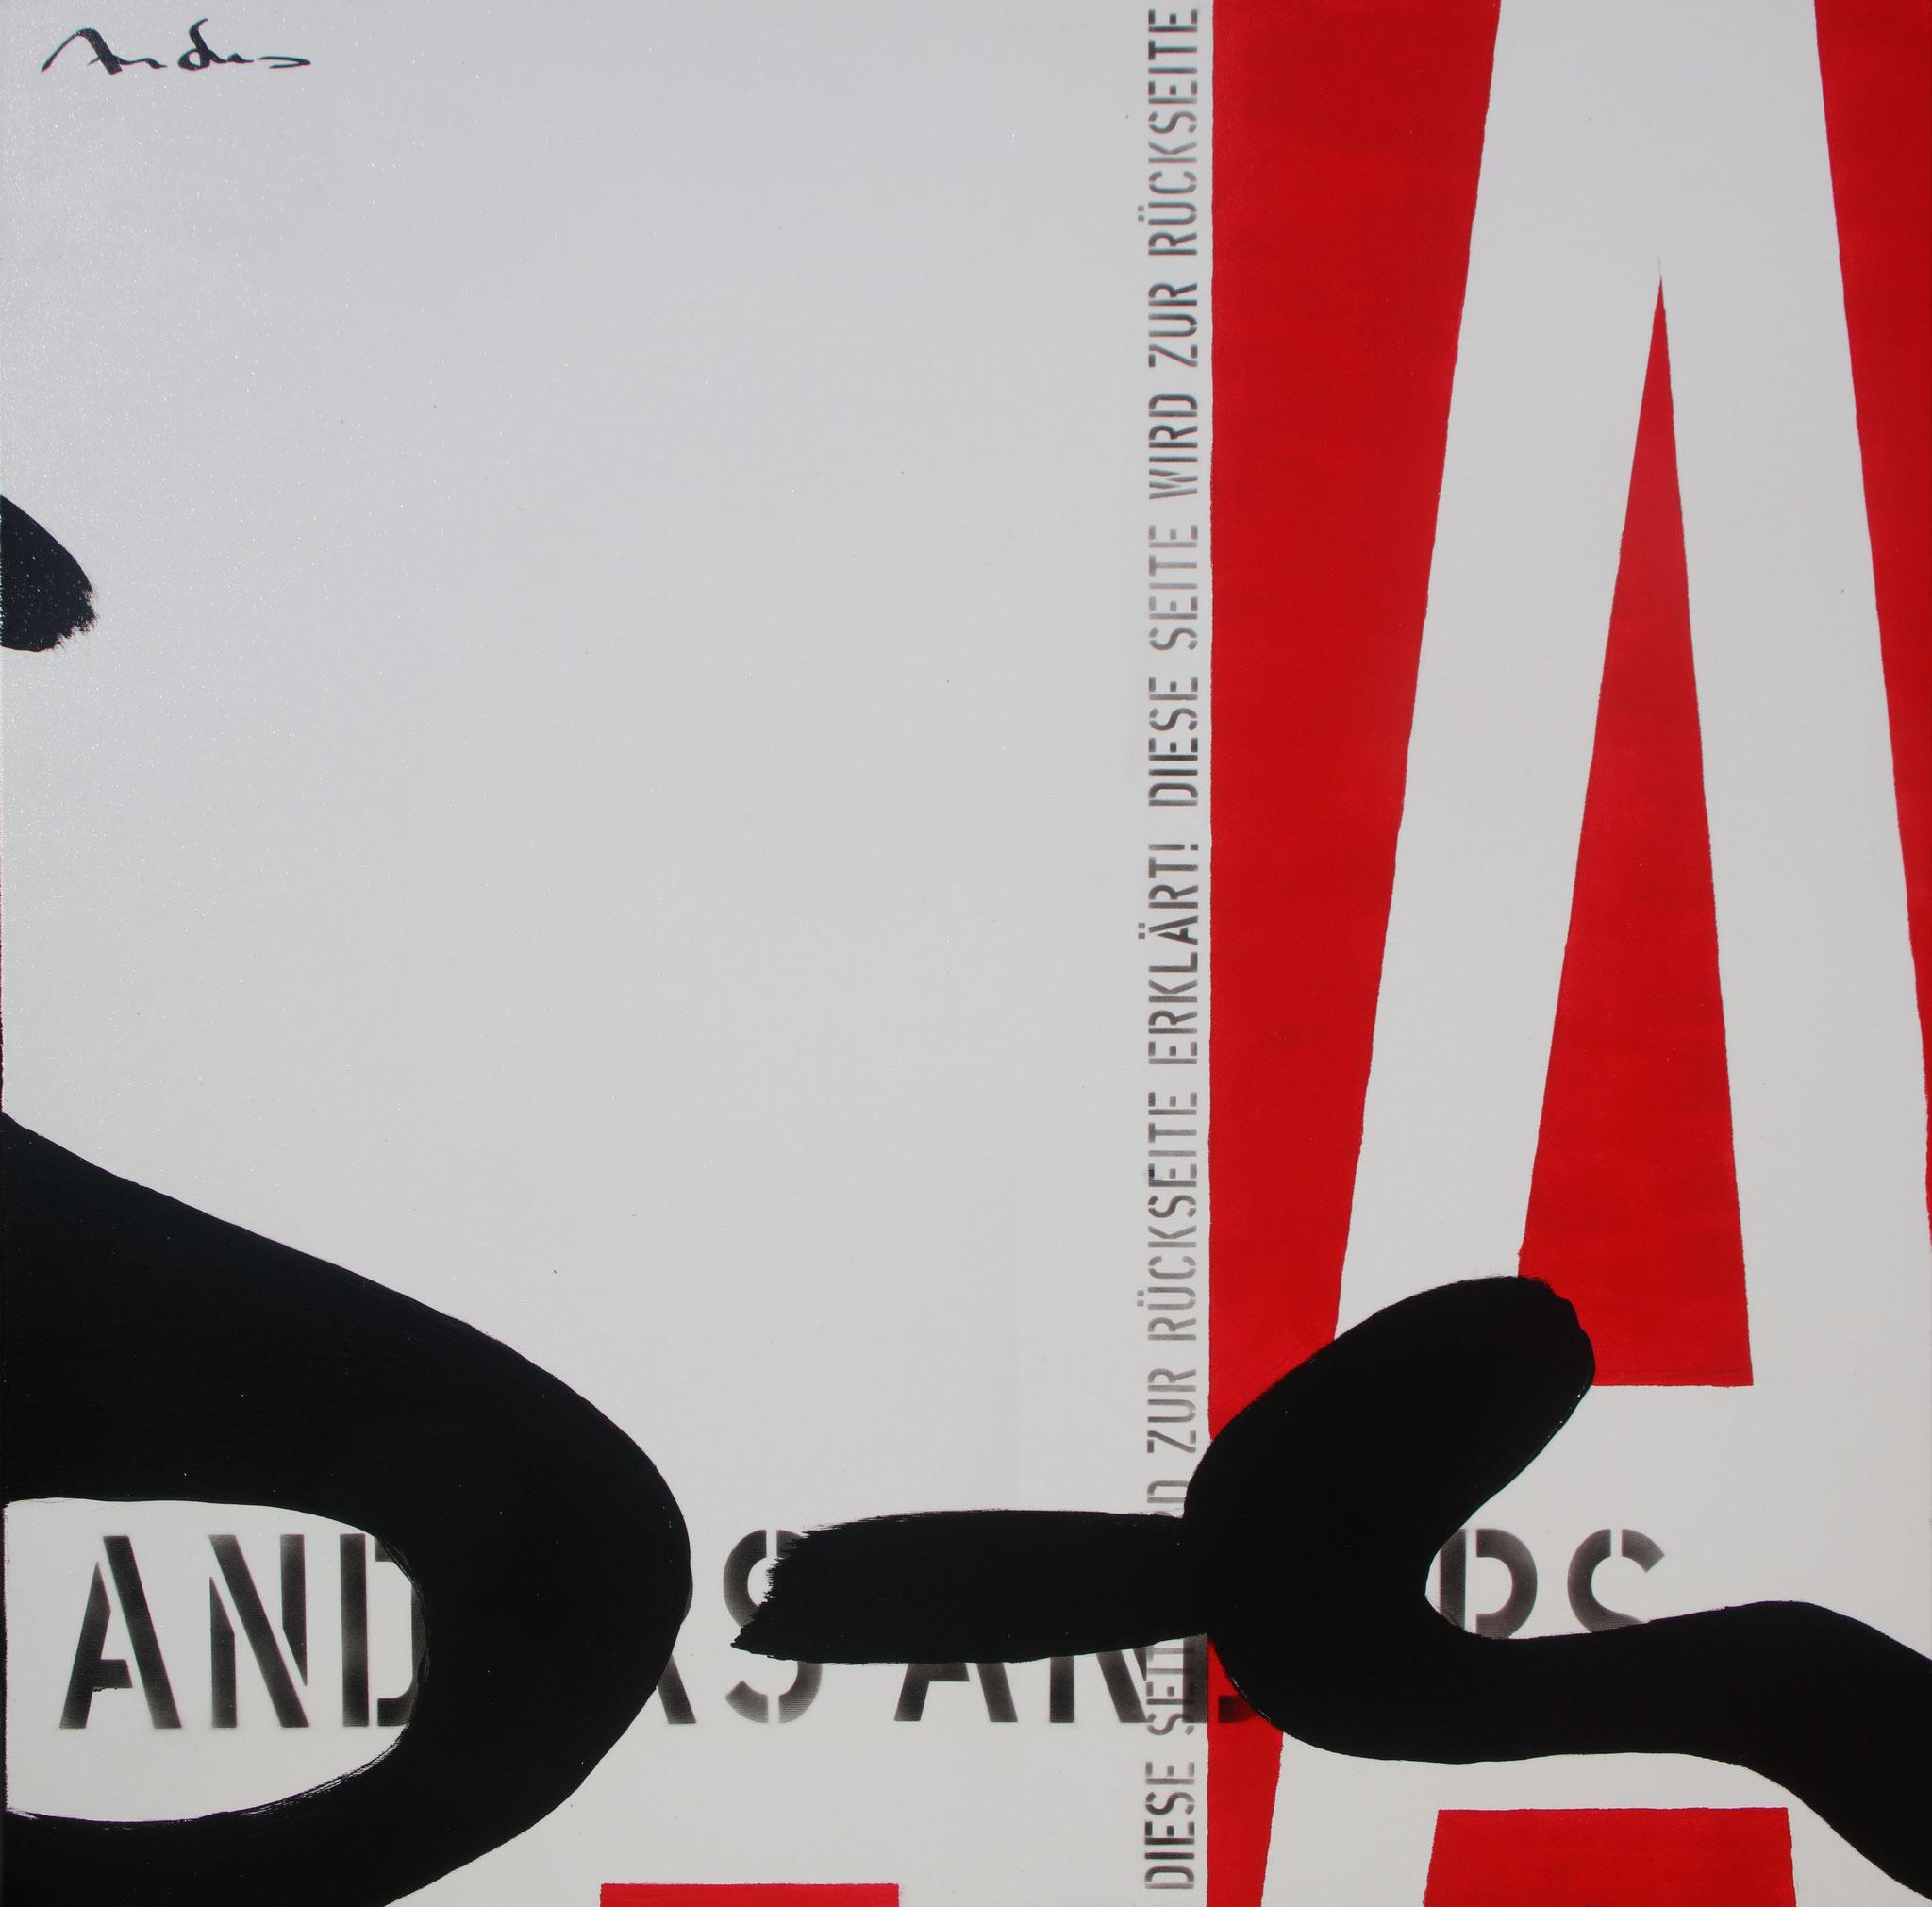 Heureka X - Rückseite - Acryl-/Mischtechnik auf Leinwand - 100 x 100 cm